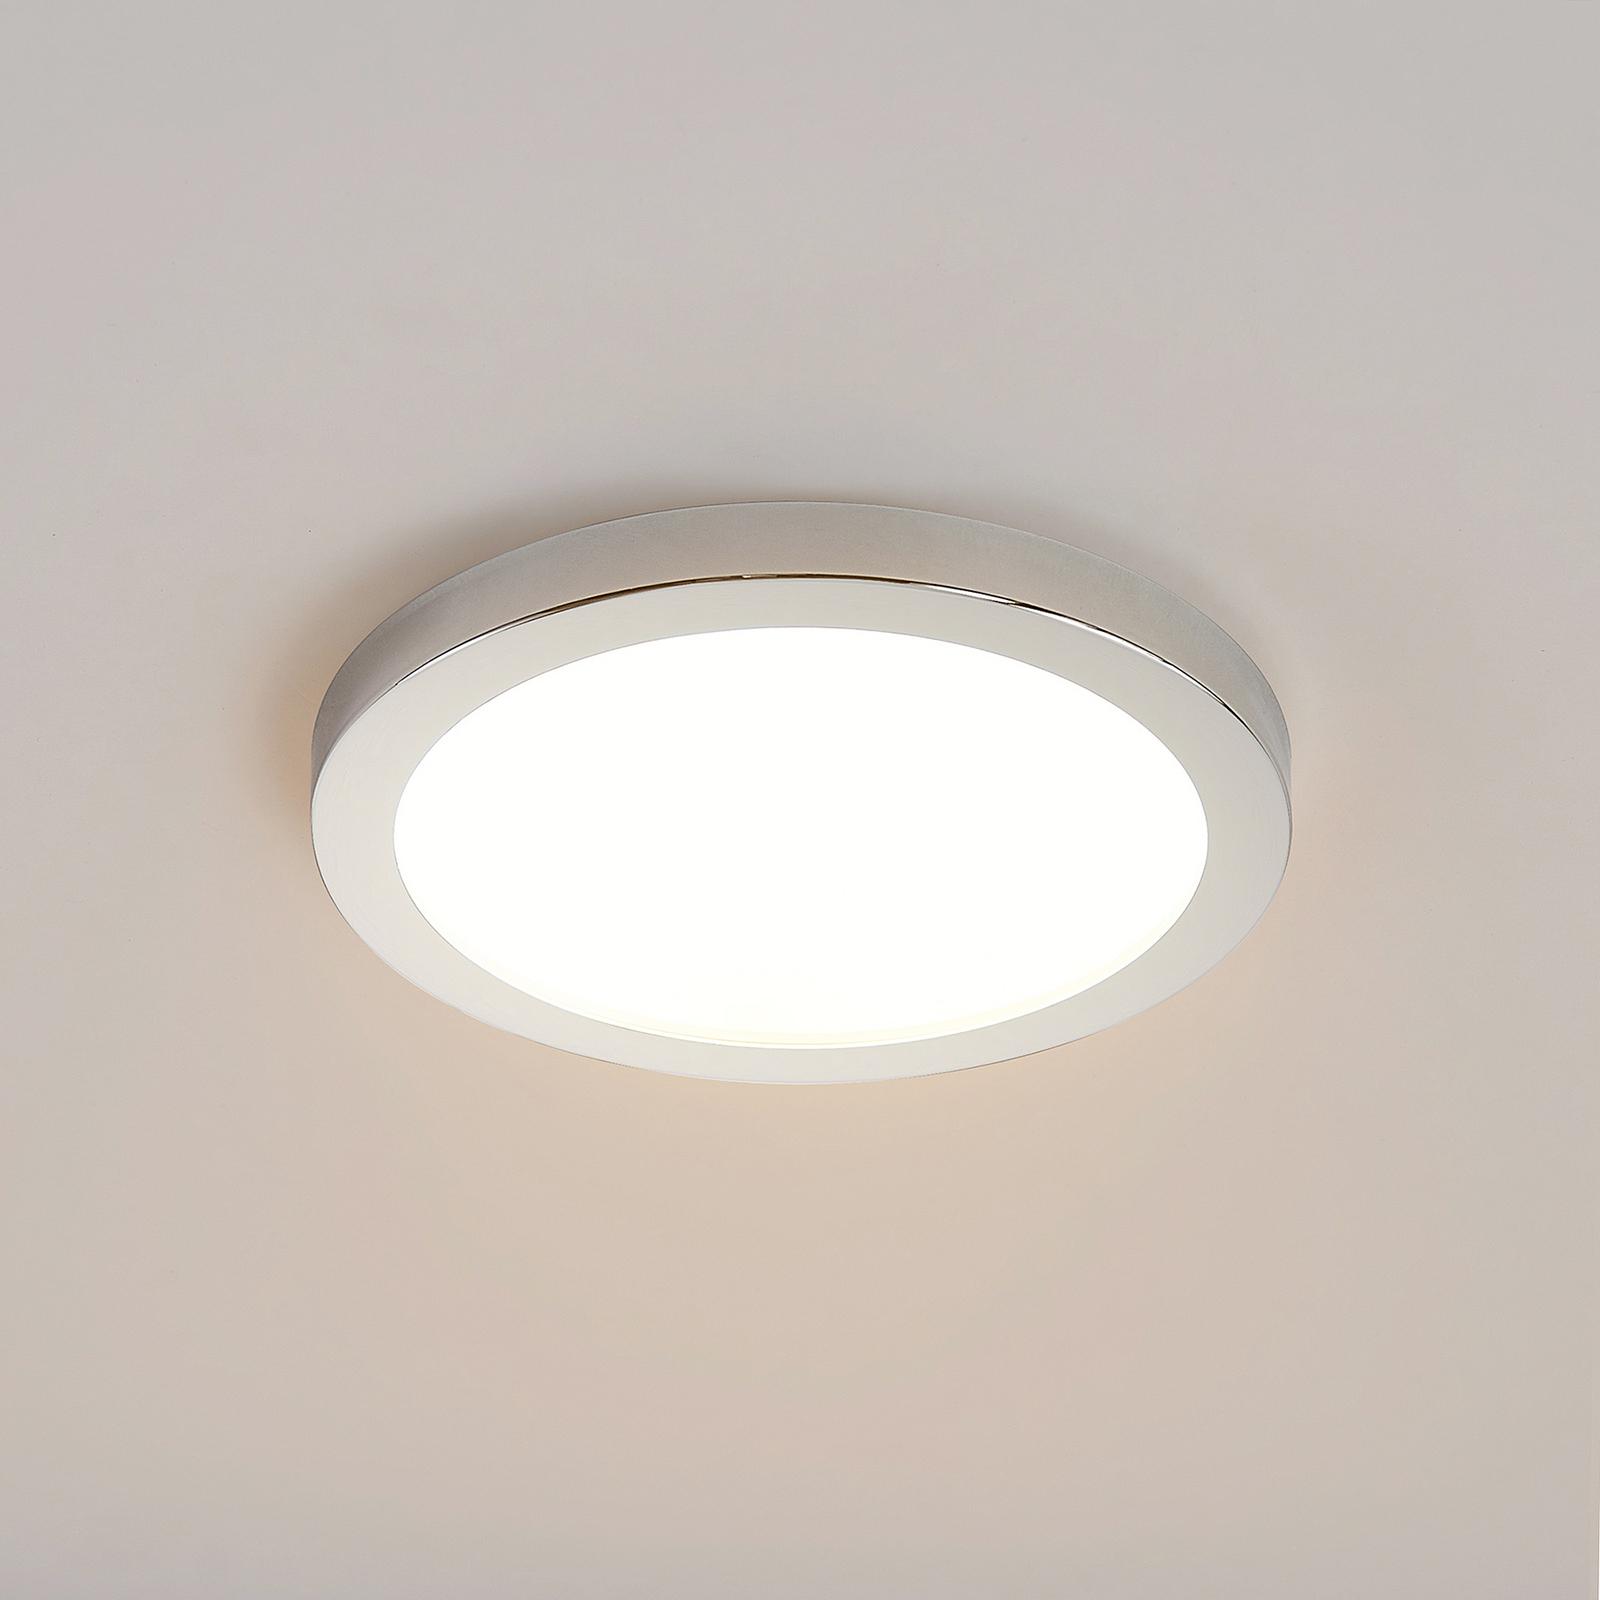 Lindby Skrolla LED-Einbaulampe, IP44, 1 Stück